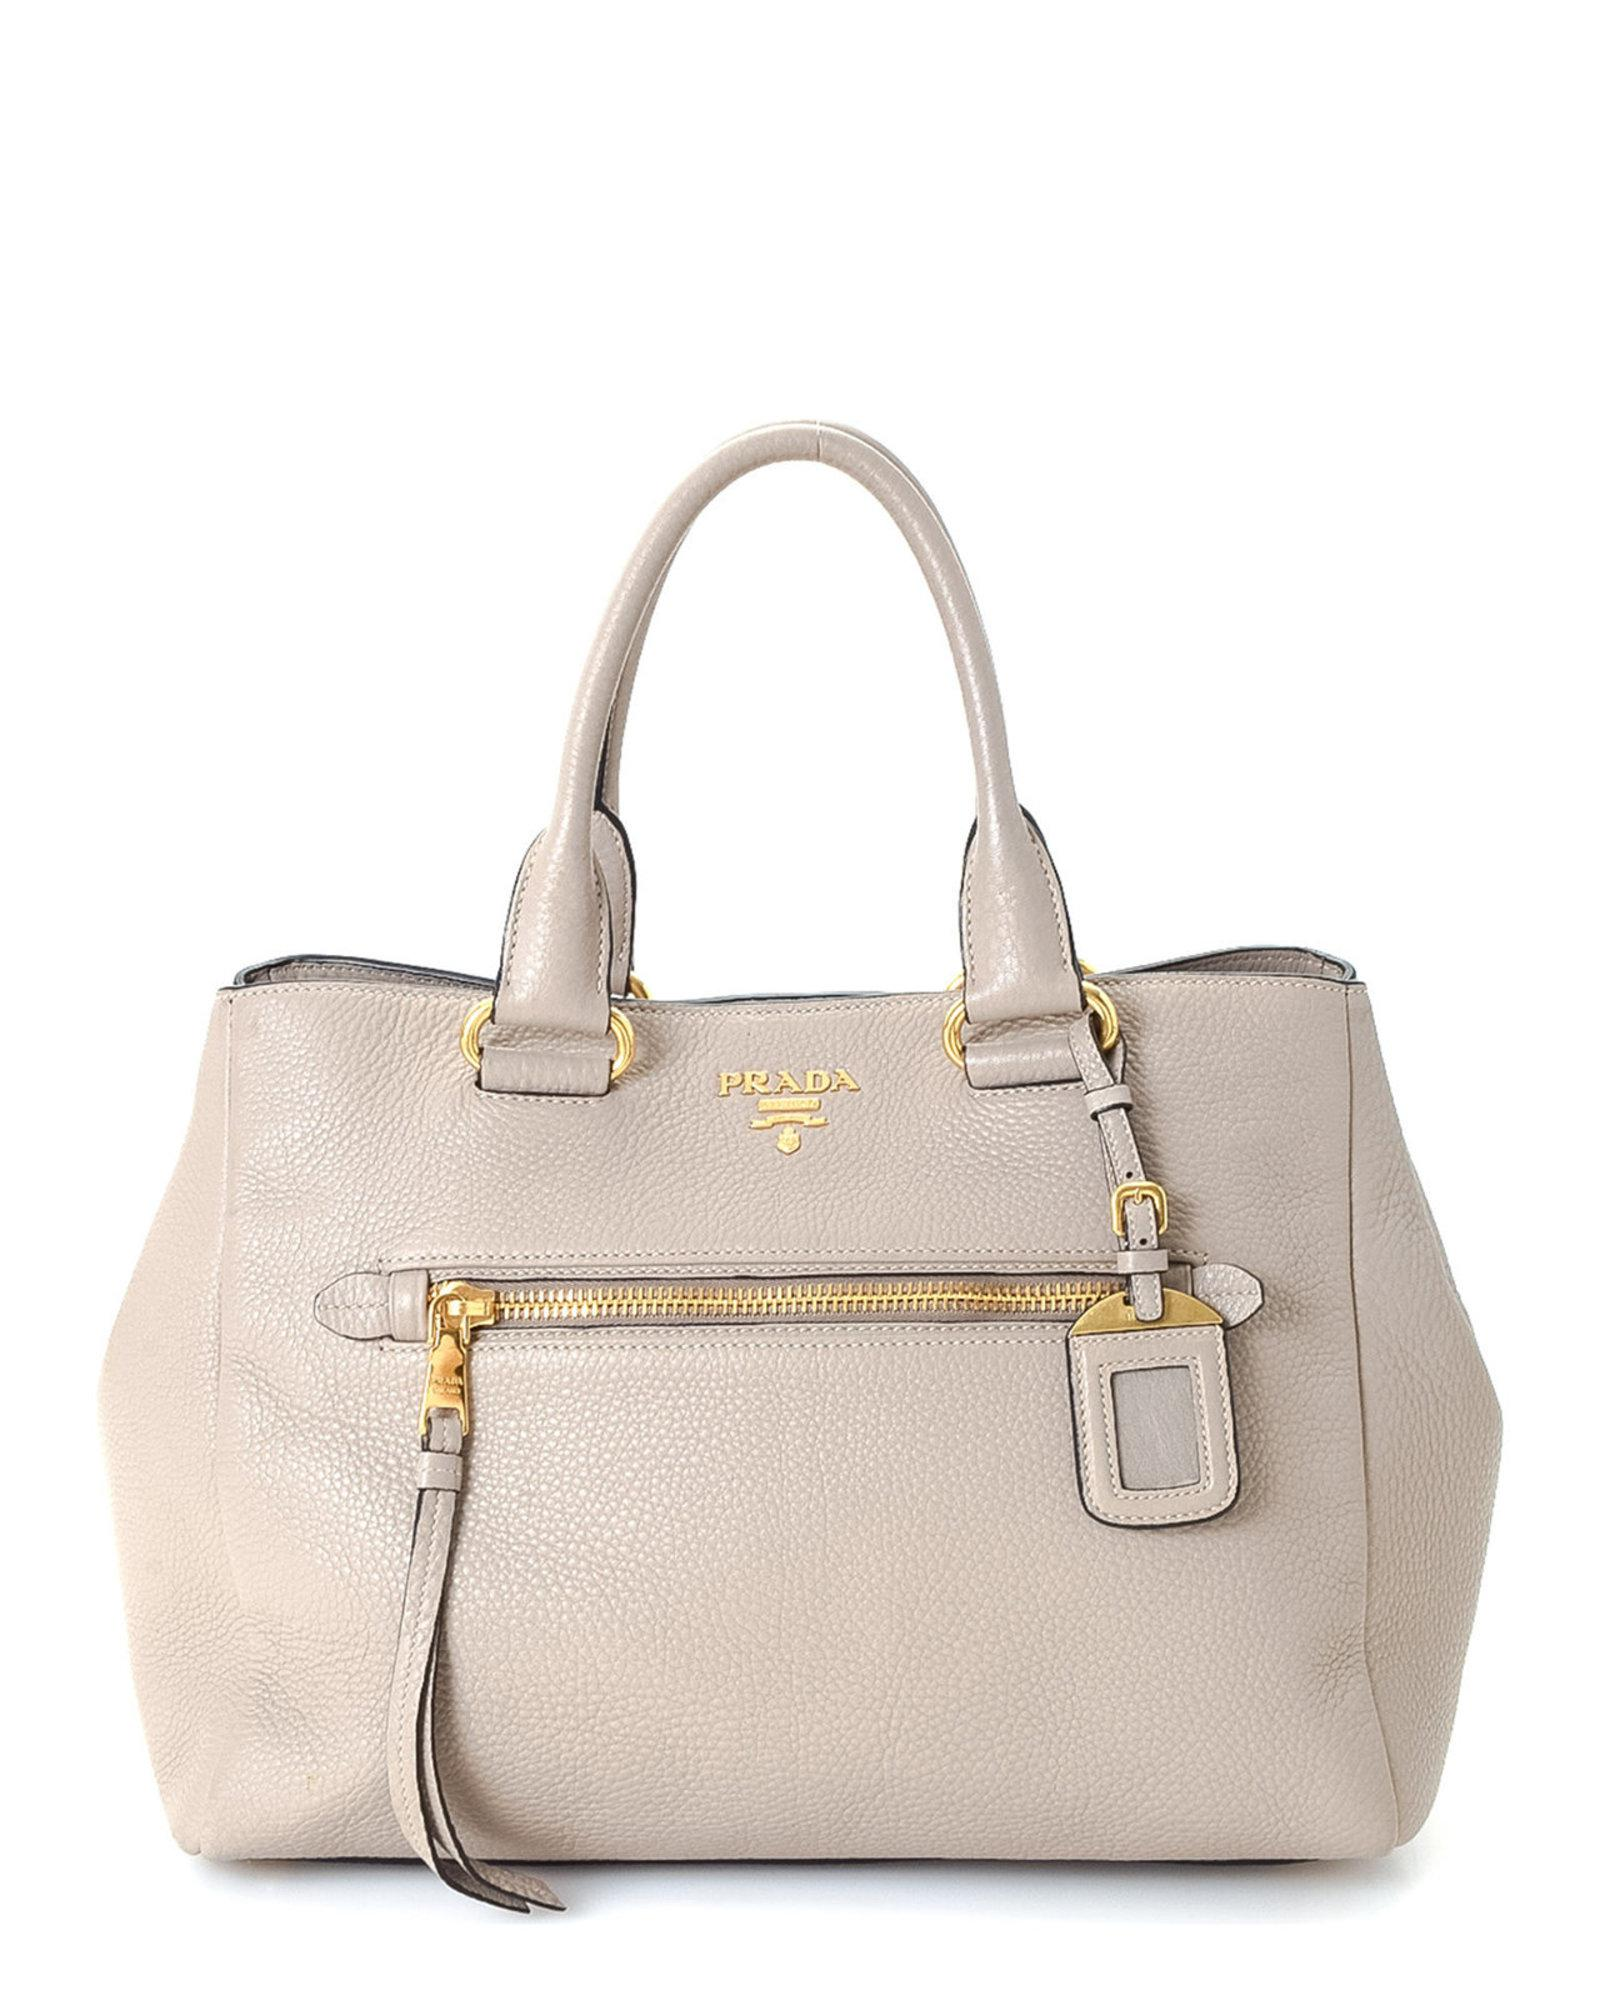 4455e04d0567f Lyst - Prada Vitello Daino Tote Bag - Vintage in Gray